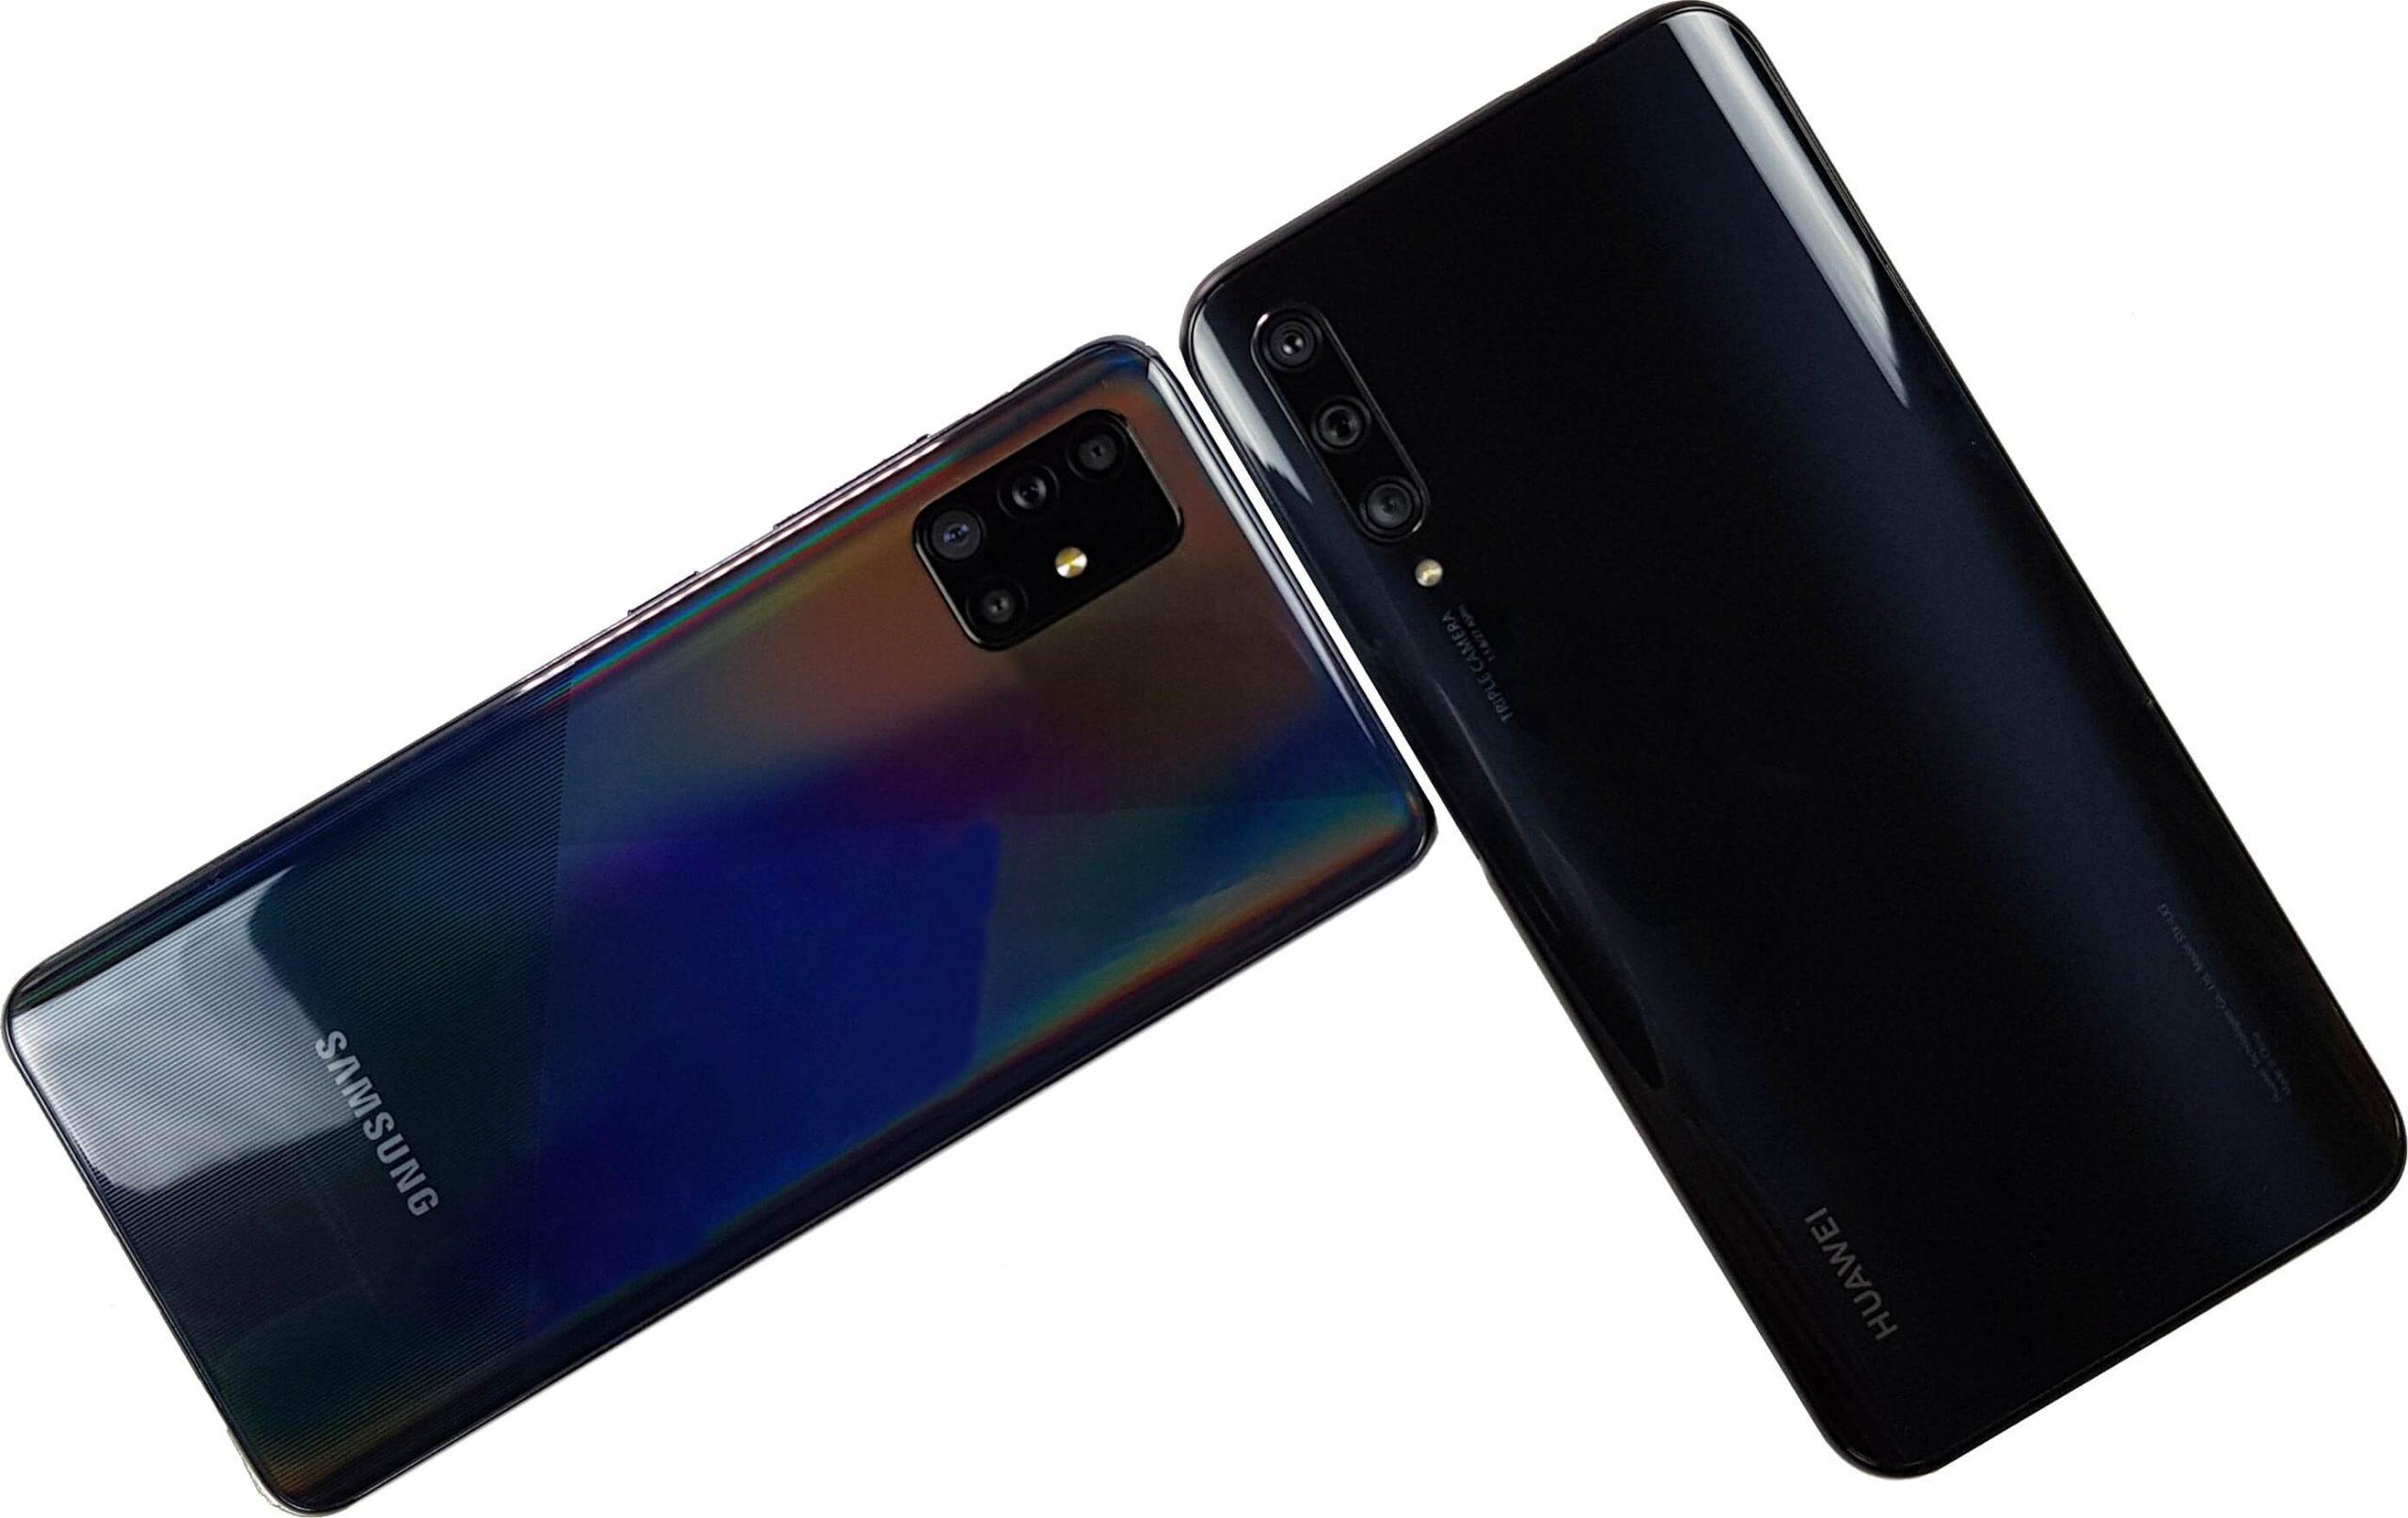 Comparativa: Samsung Galaxy A51 vs Huawei Y9s